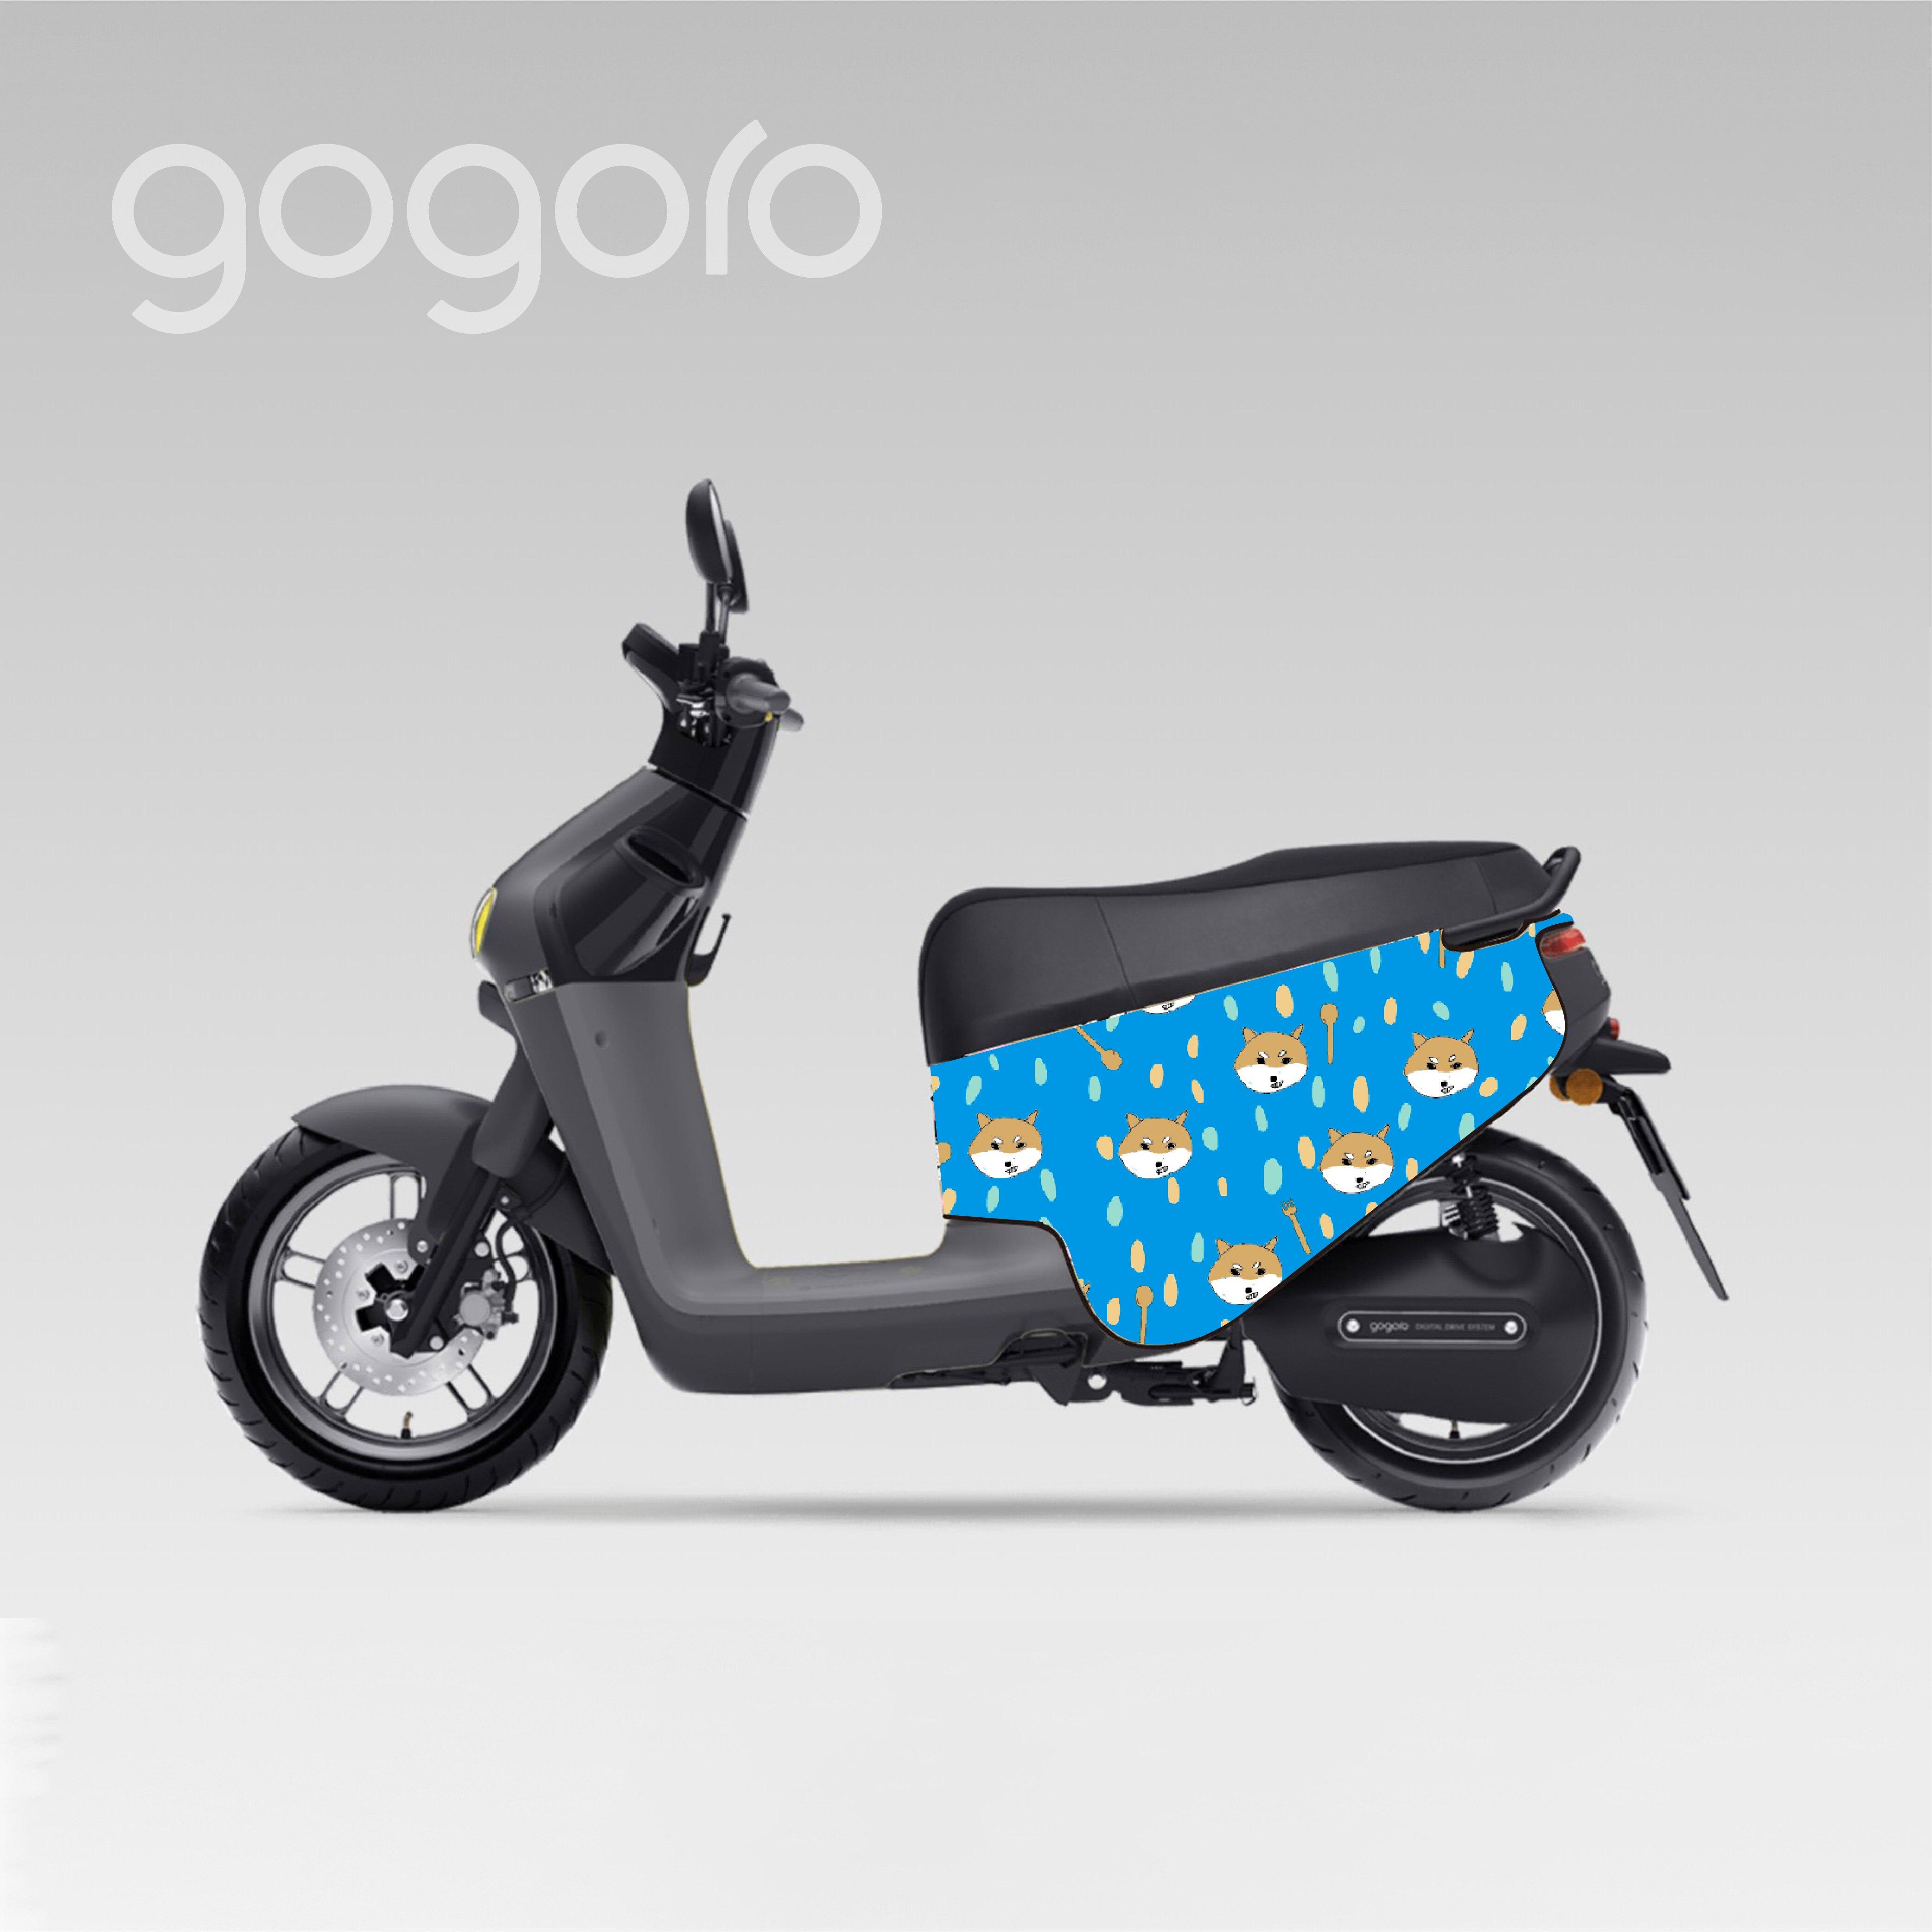 BLR gogoro ID12 手繪柴犬 雙面車套 車身防刮套 潛水衣布 防刮套 保護套 車套 機車配備 電動車防刮 智慧雙輪